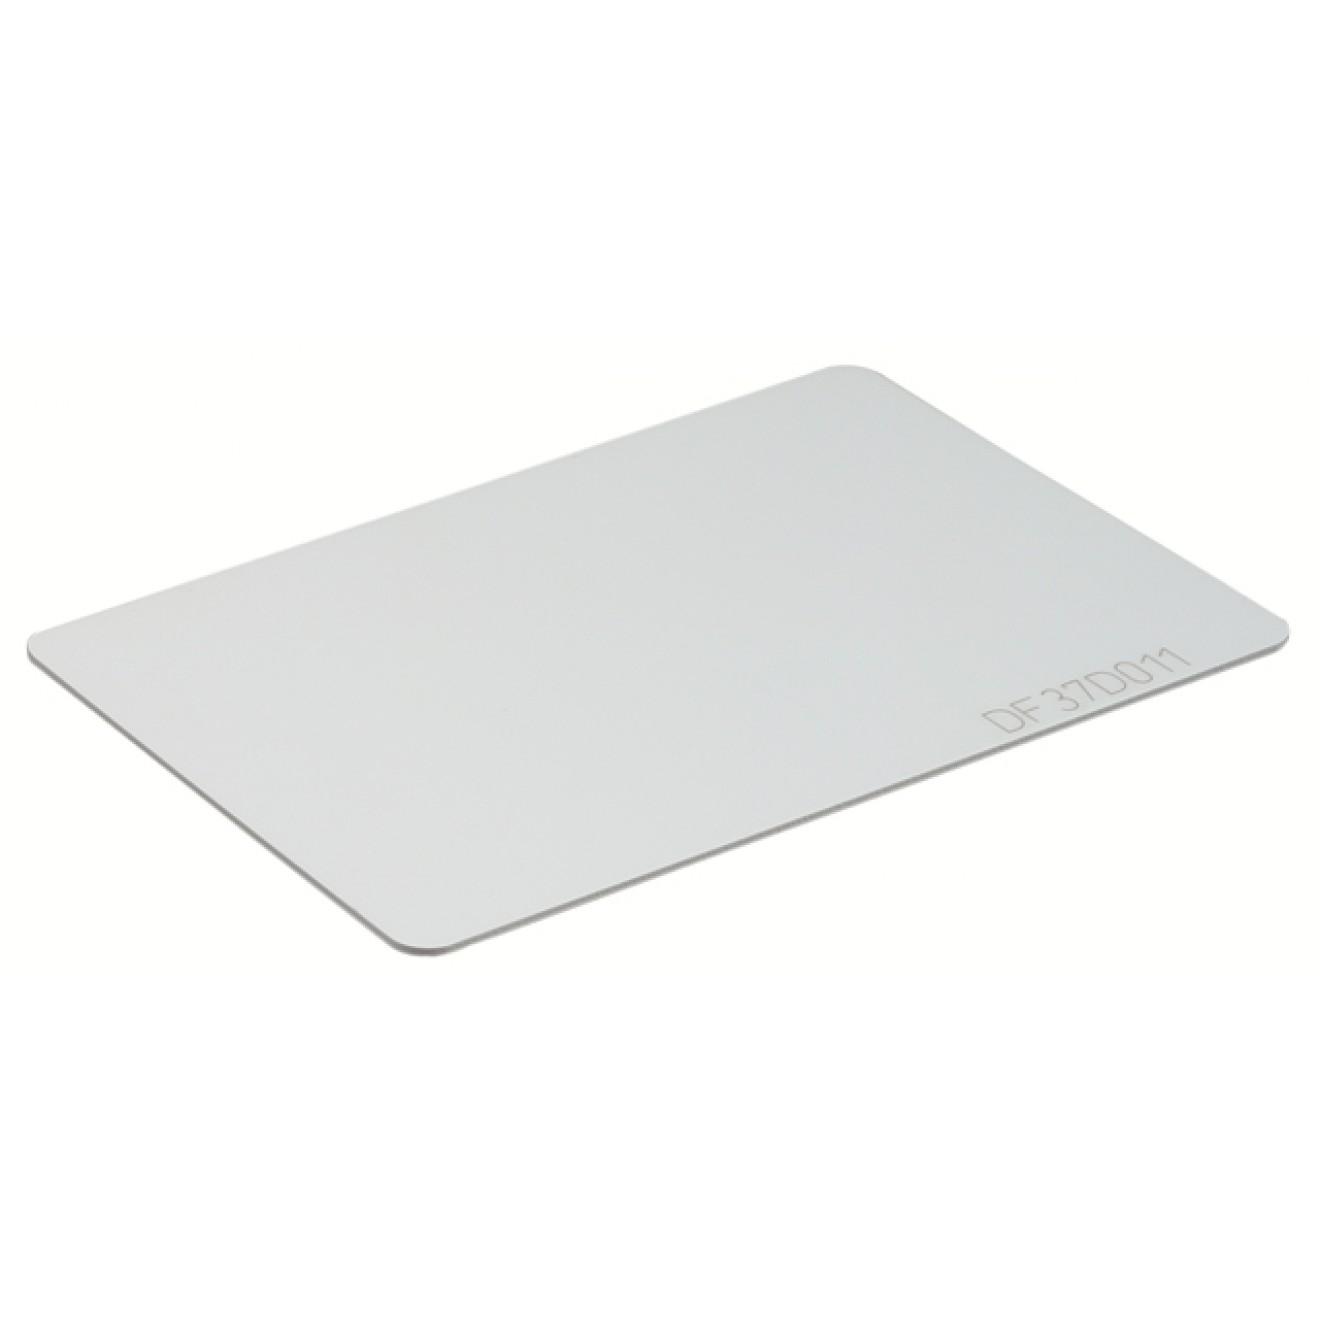 protector scheckkartentransponder f r elektronische schlie zylinder. Black Bedroom Furniture Sets. Home Design Ideas